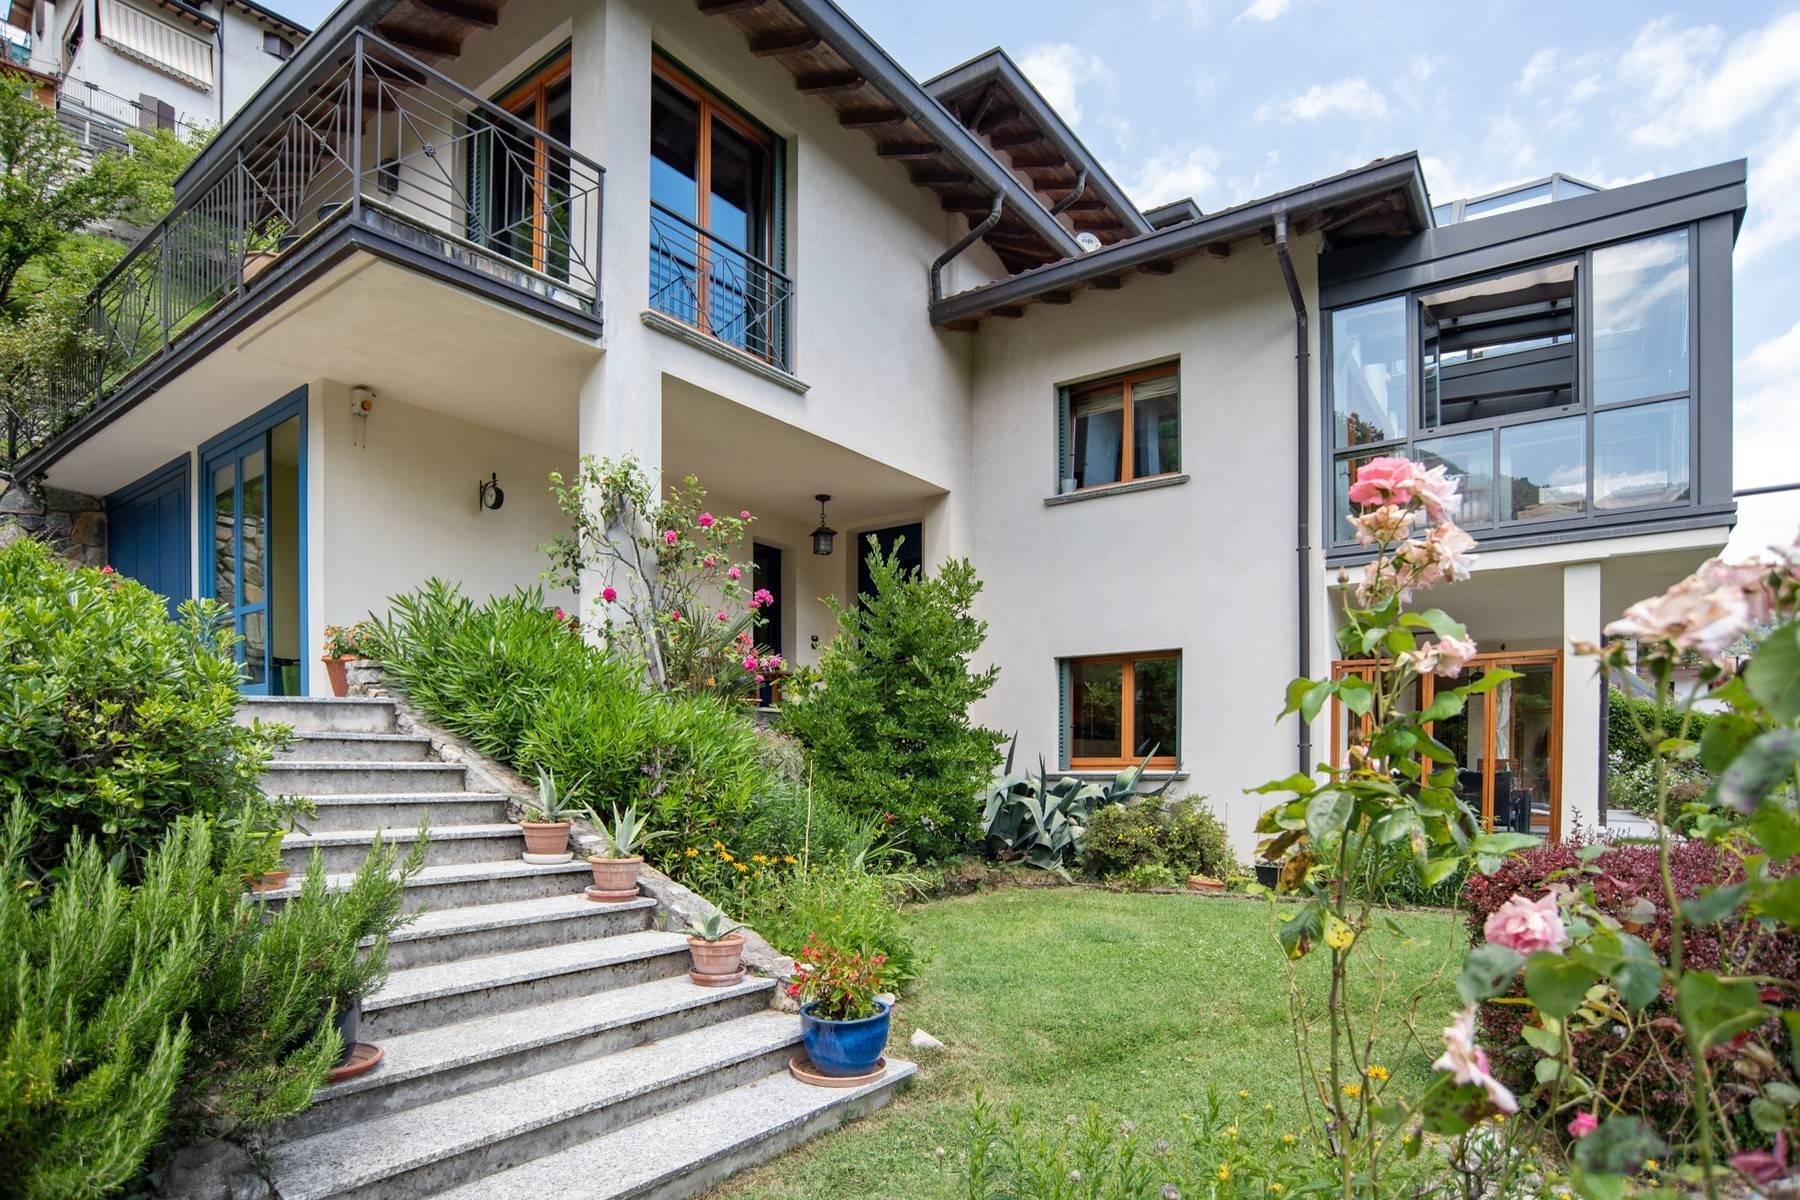 Splendida villa moderna sulla collina soleggiata sopra Argegno - 6